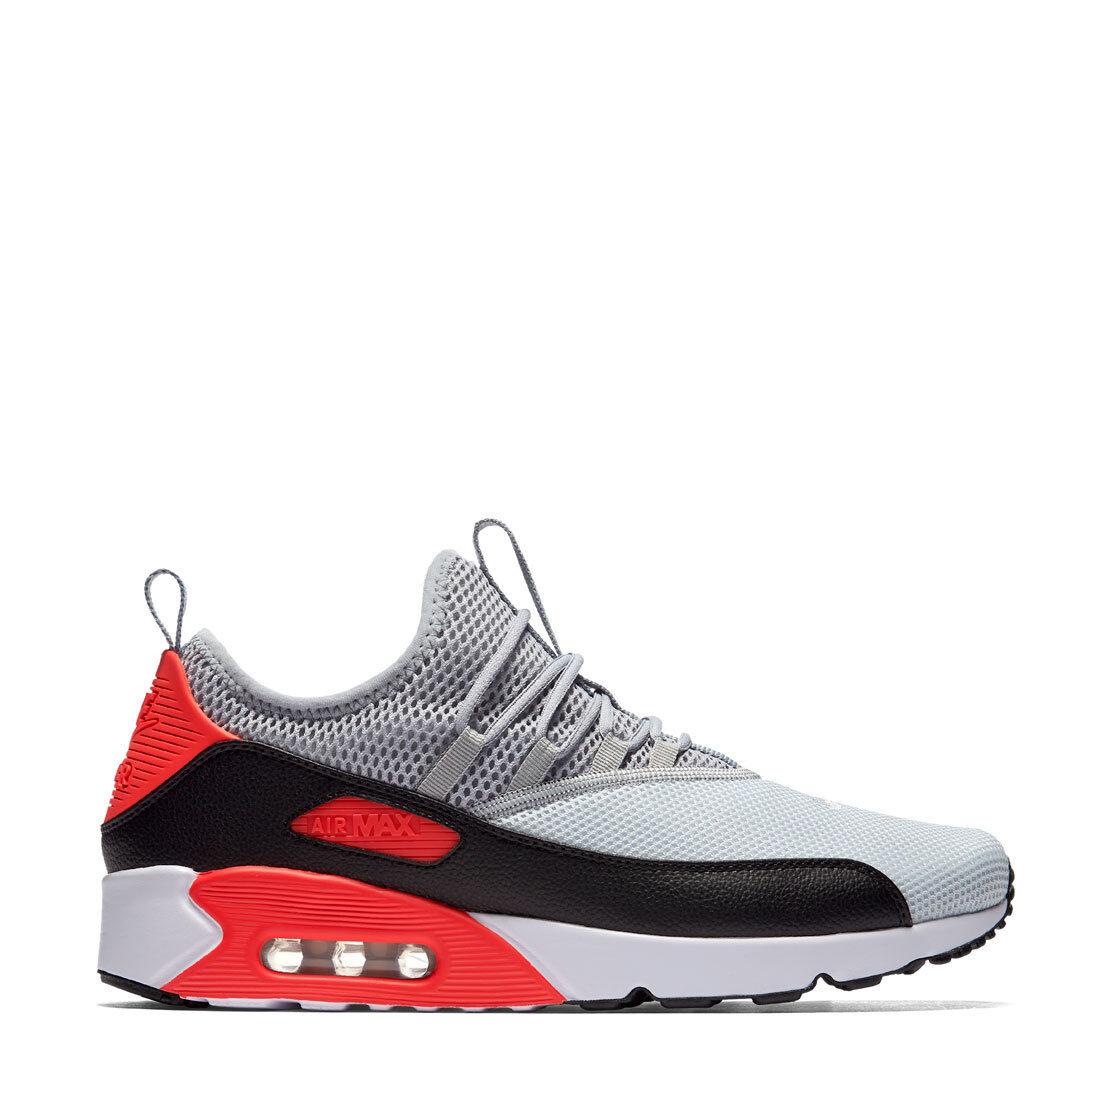 Los hombres de Nike Casual Air Max 90 ez Casual Nike zapatos Gris ao1745-002 us7-11 04 ' d351cb